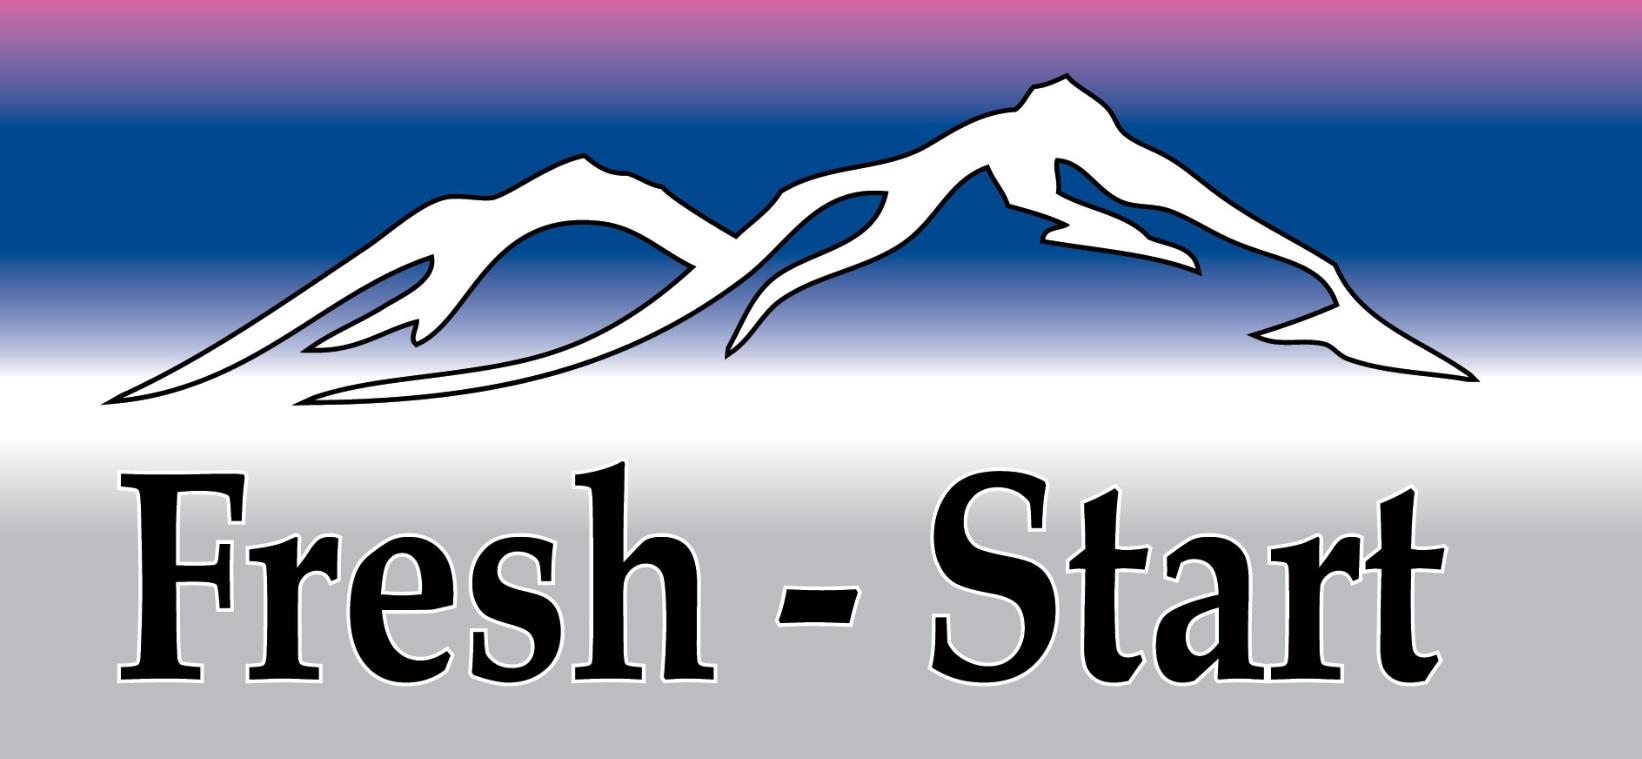 Fresh-Start image 0